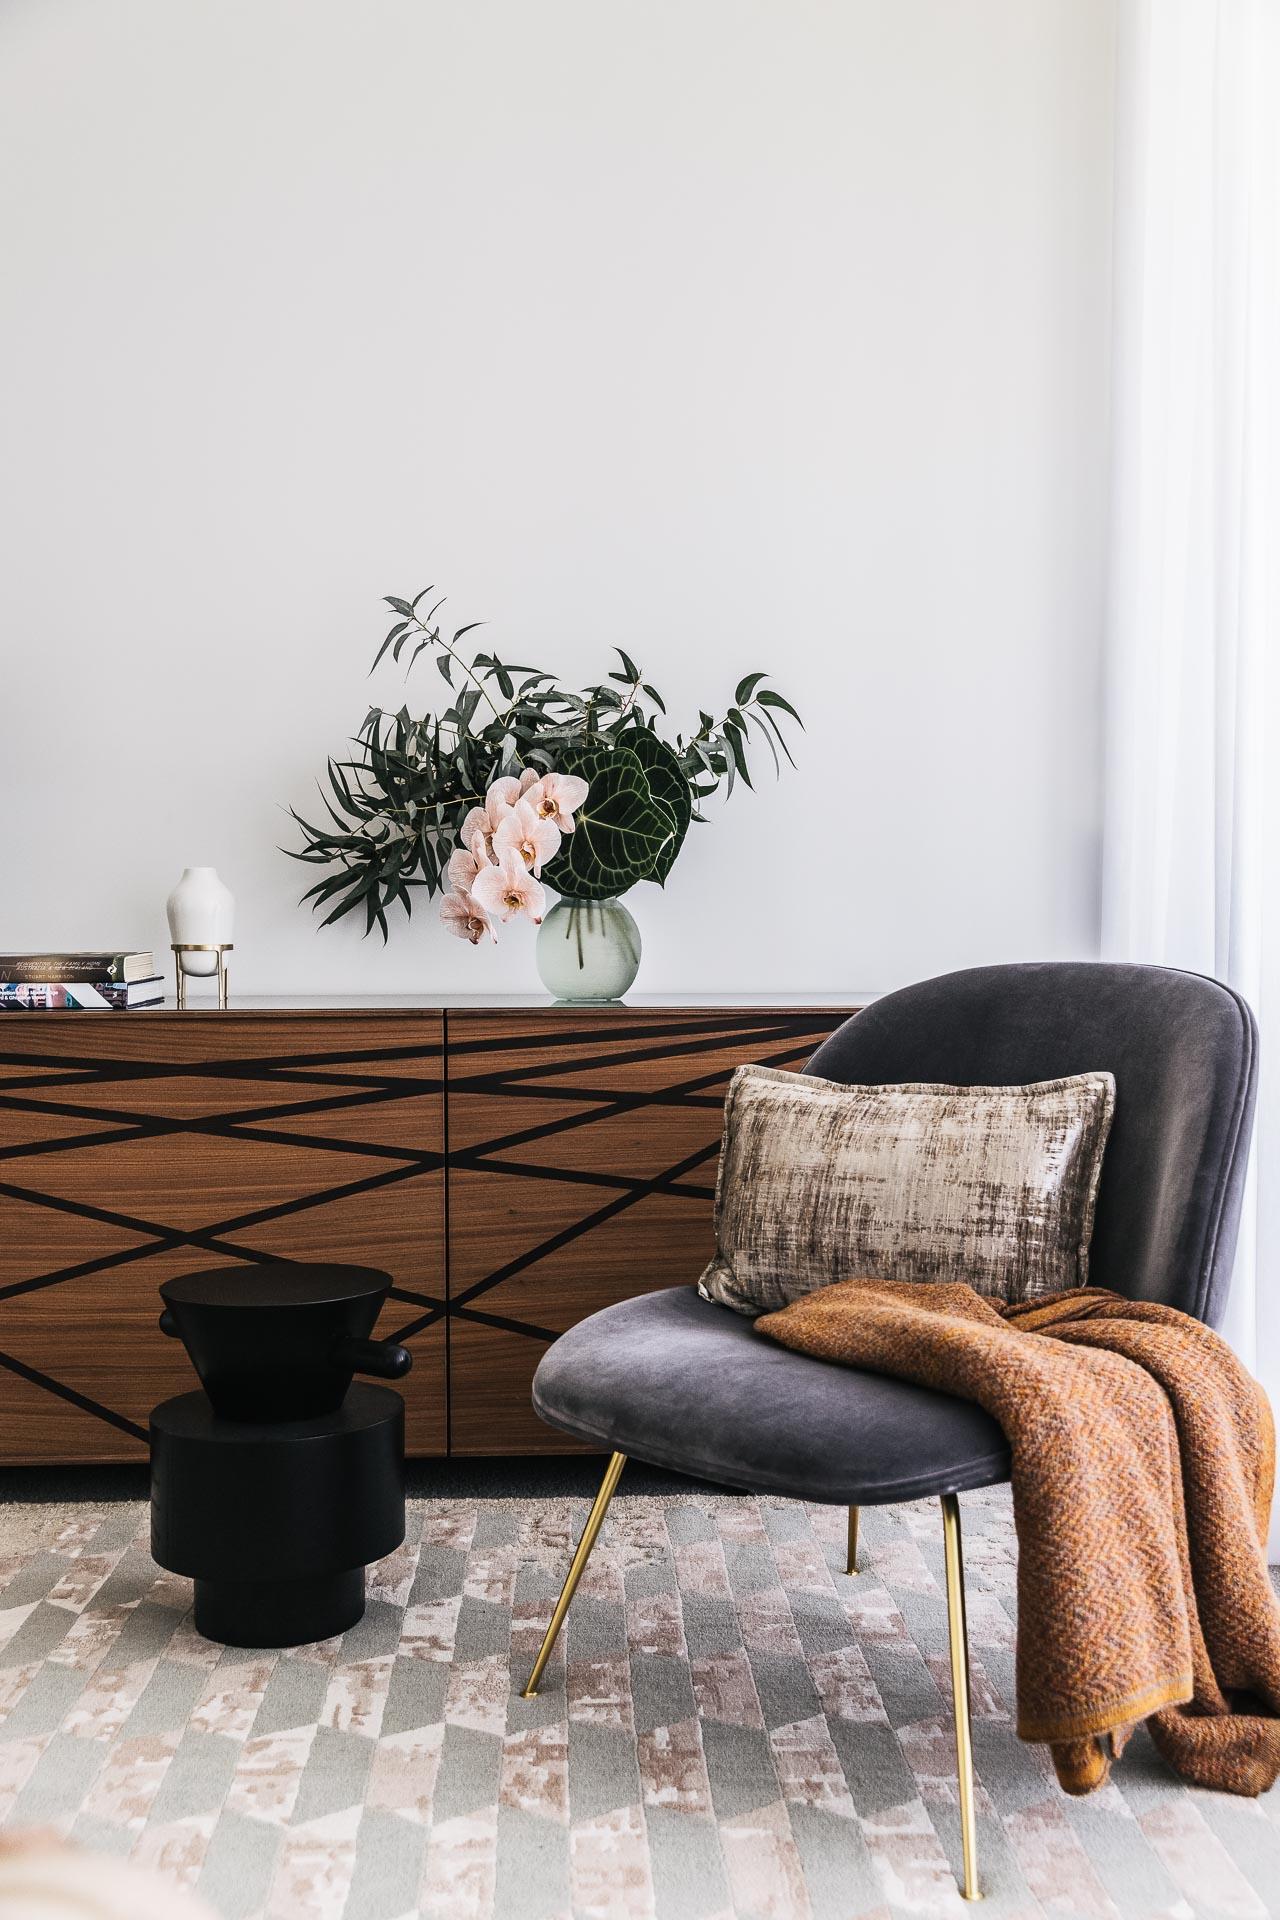 WEB - Architectural Photography Sydney - Open House Perth 2018  - Sebastian Photography 74.jpg